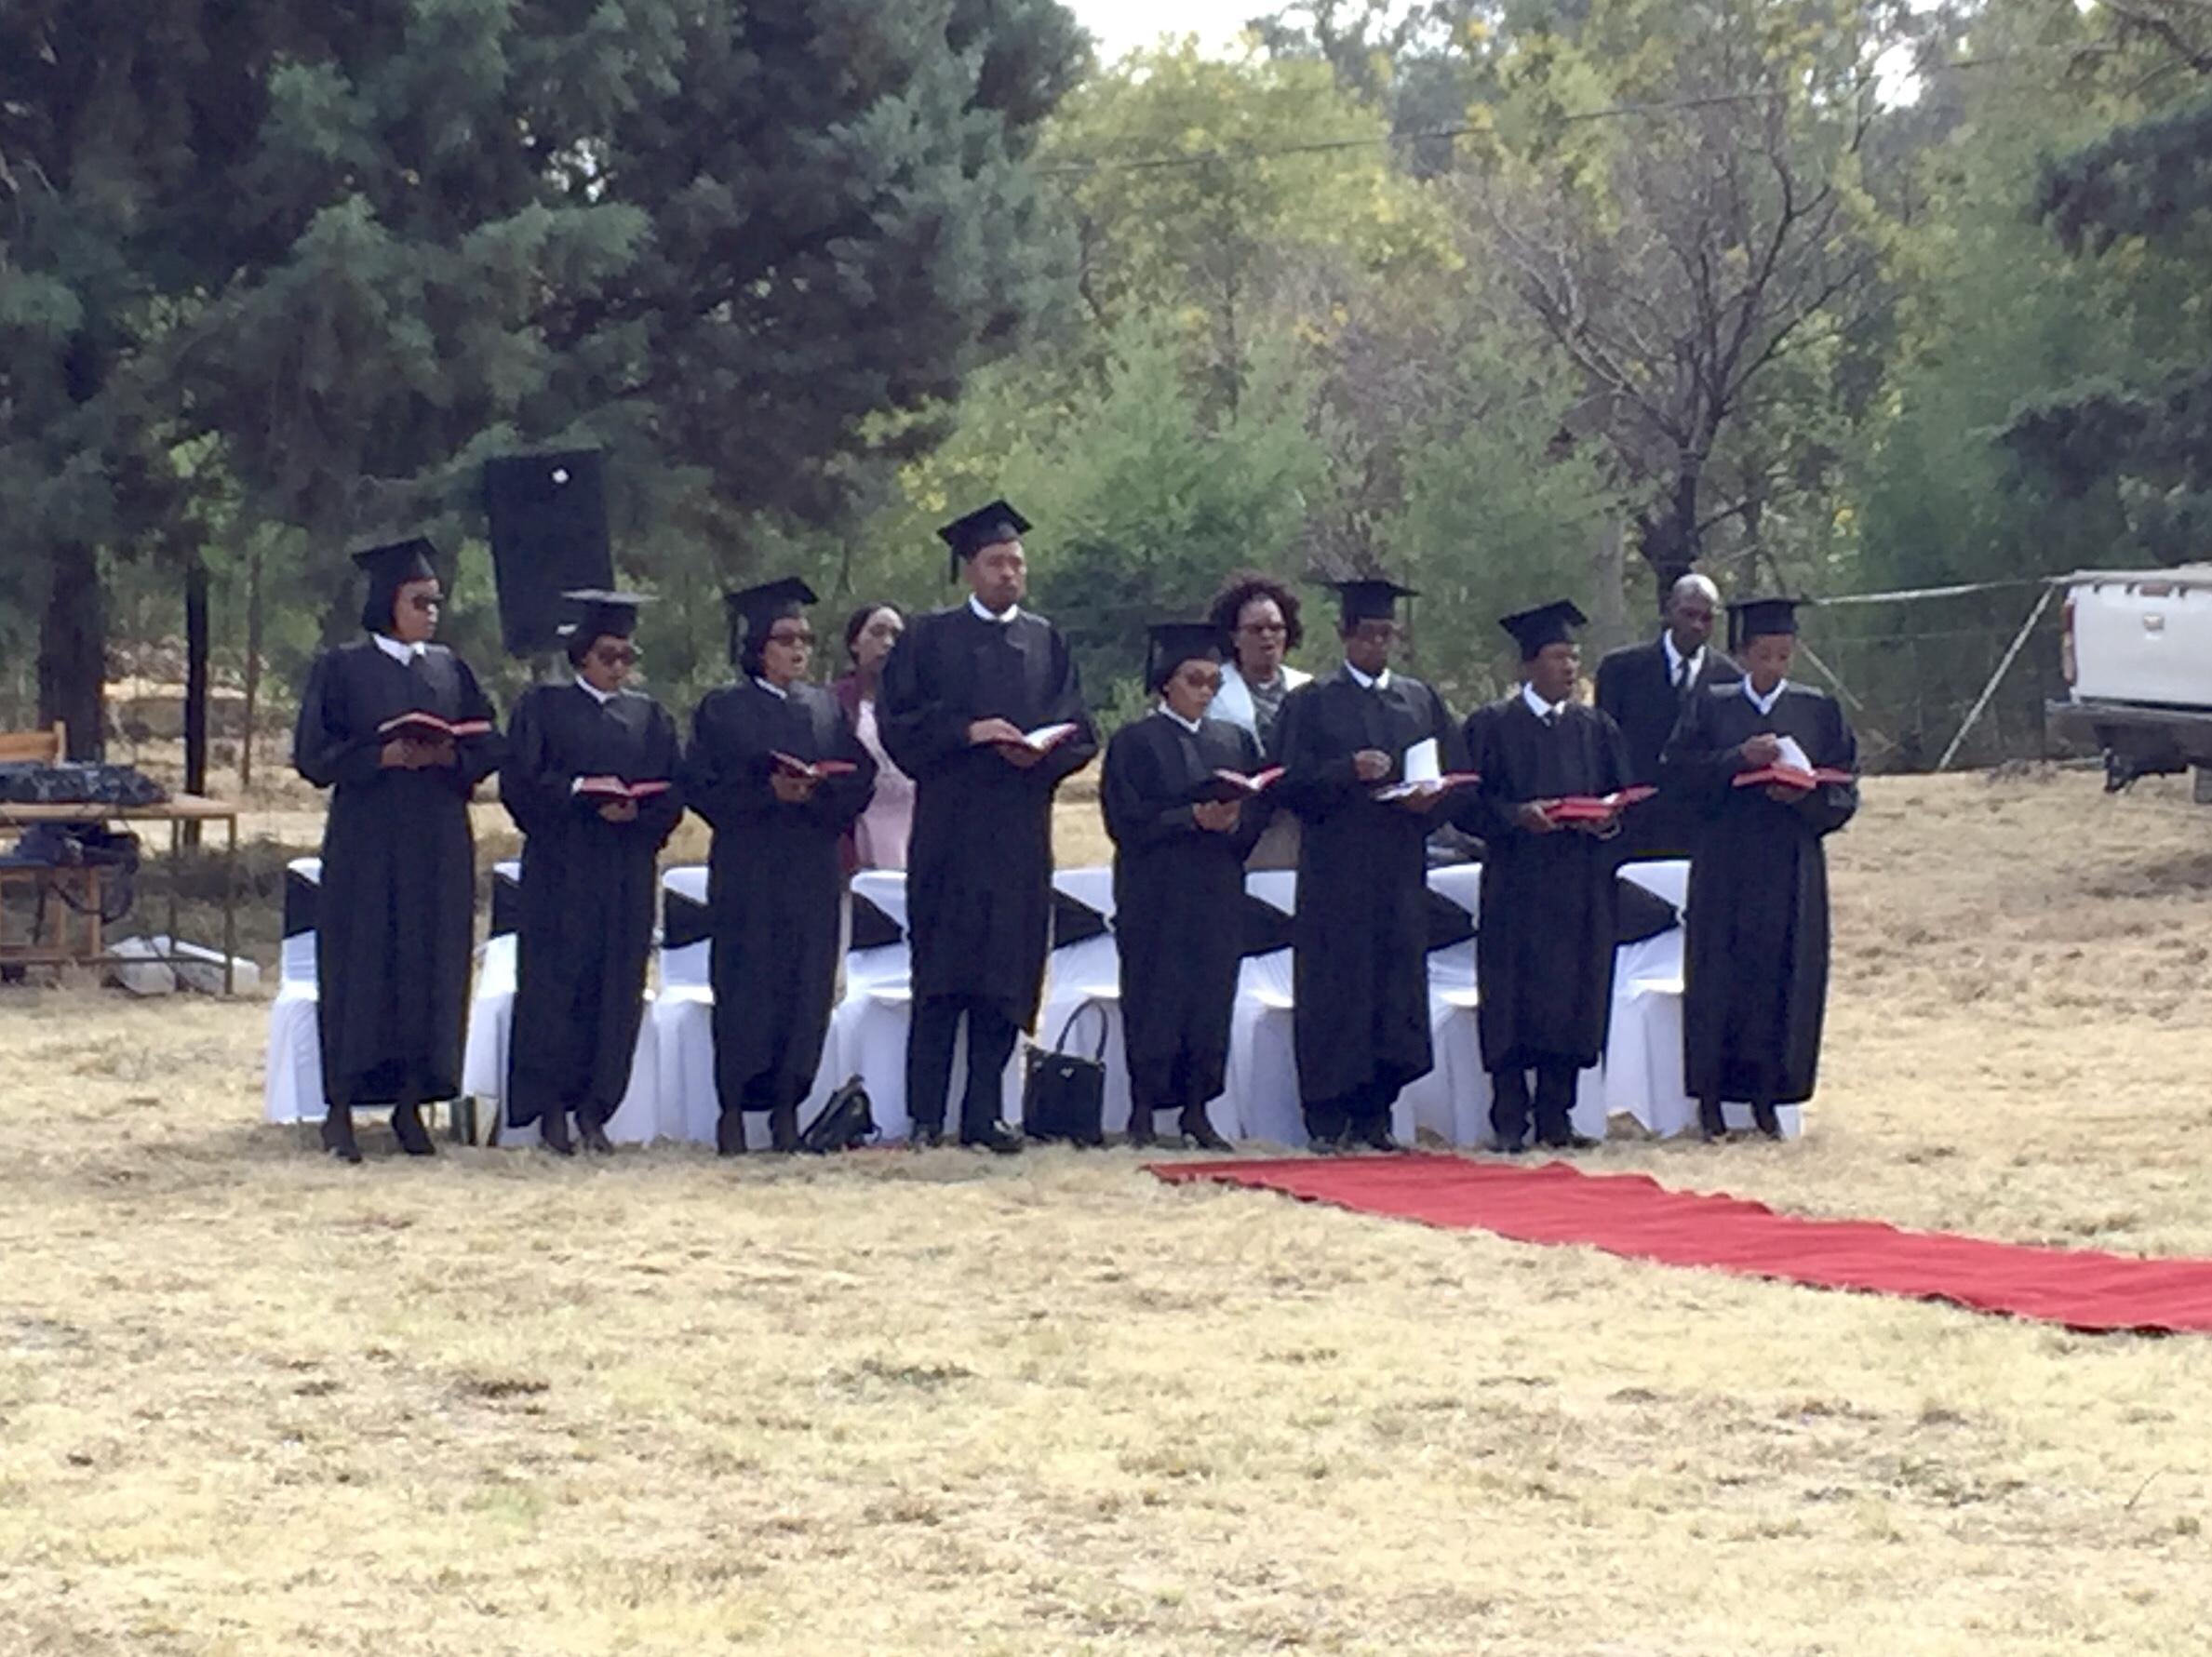 Lesotho_Mark_Knowles_MTS_2019_Graduates.jpg